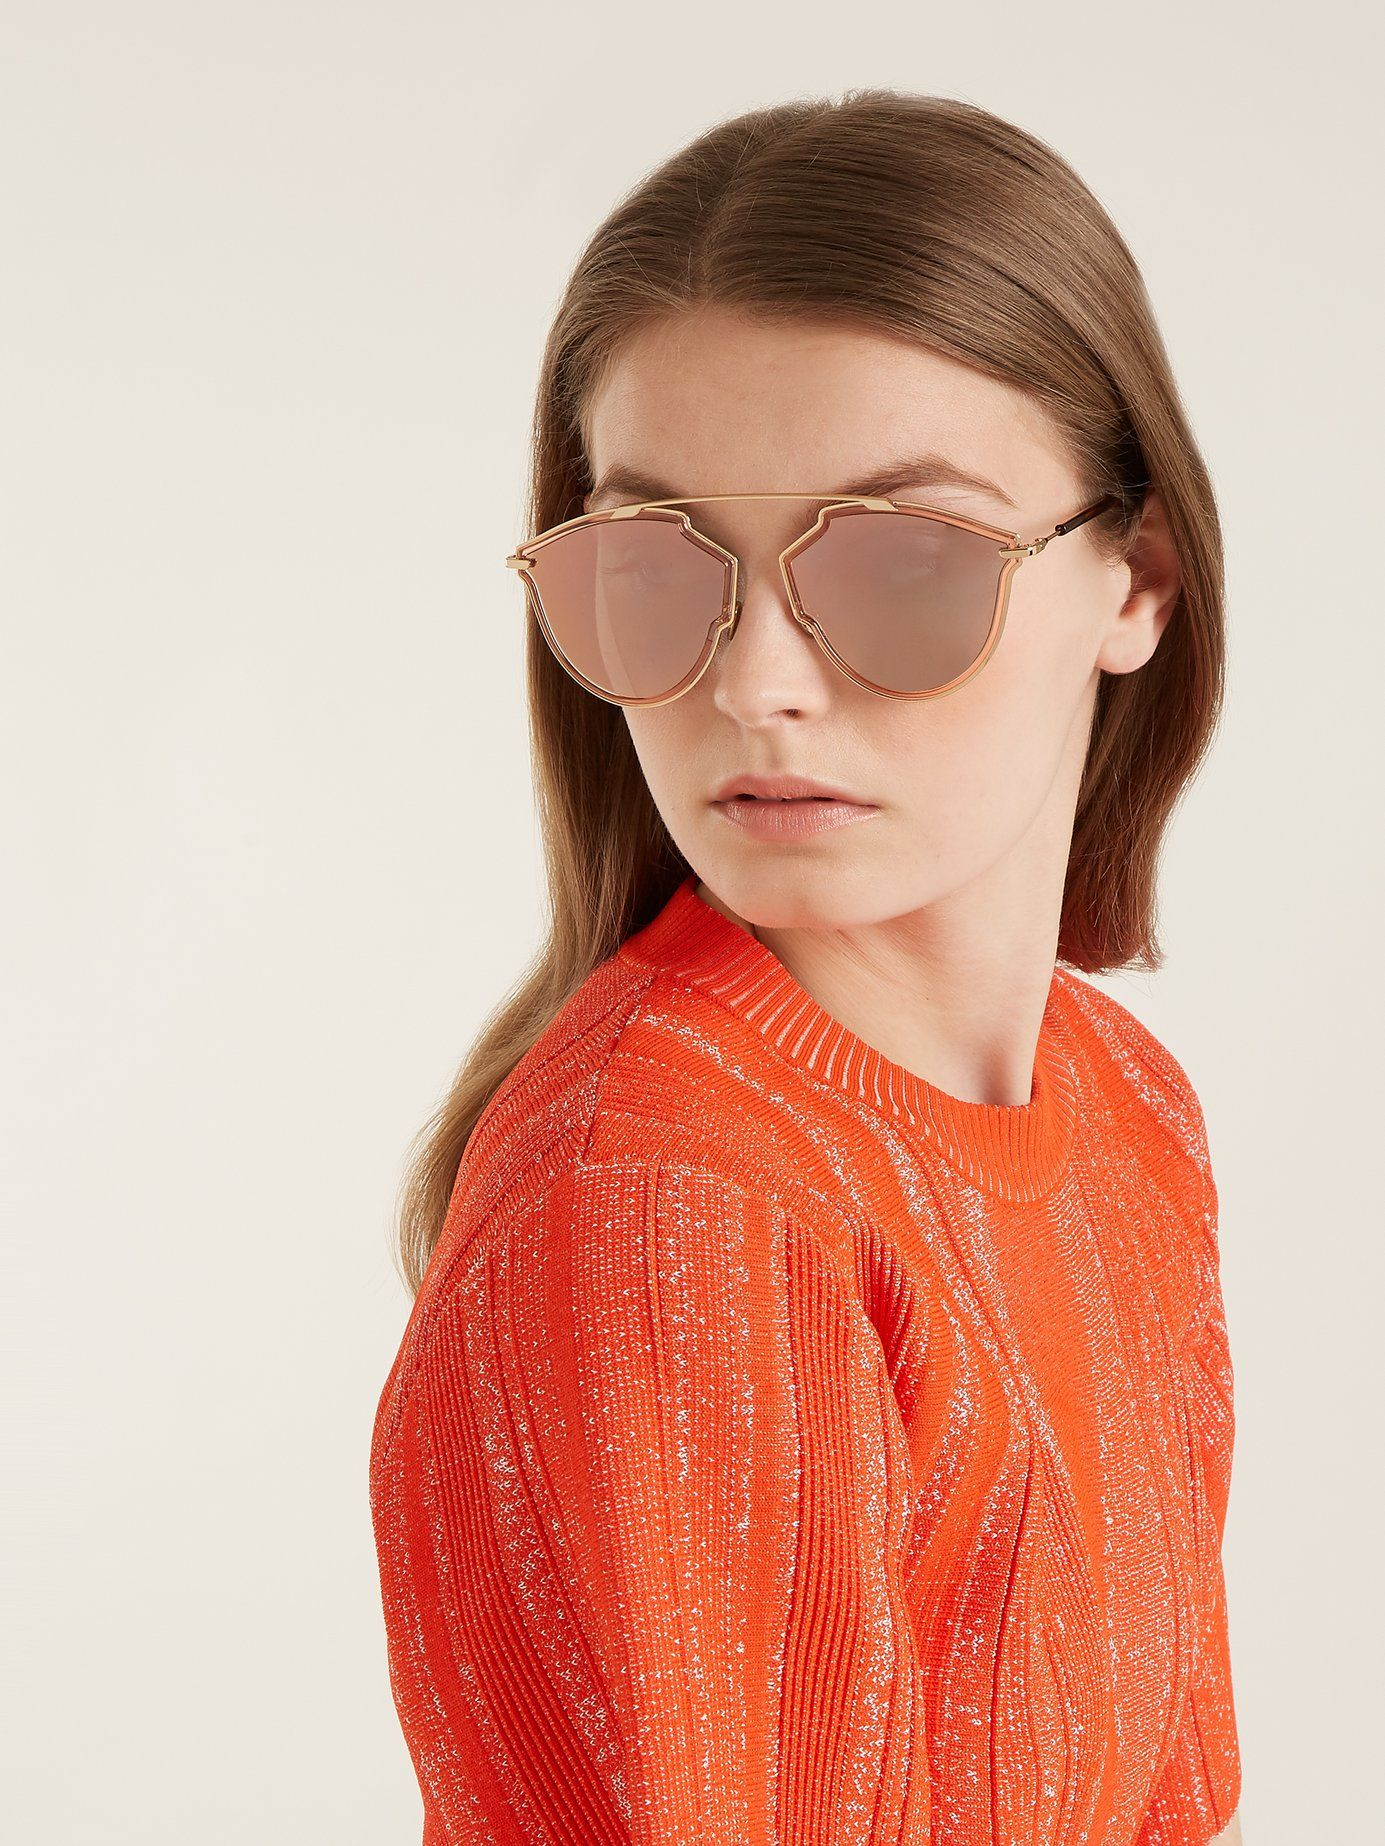 a20db8c132 Dior Eyewear DiorSoRealRise cat-eye sunglasses €348